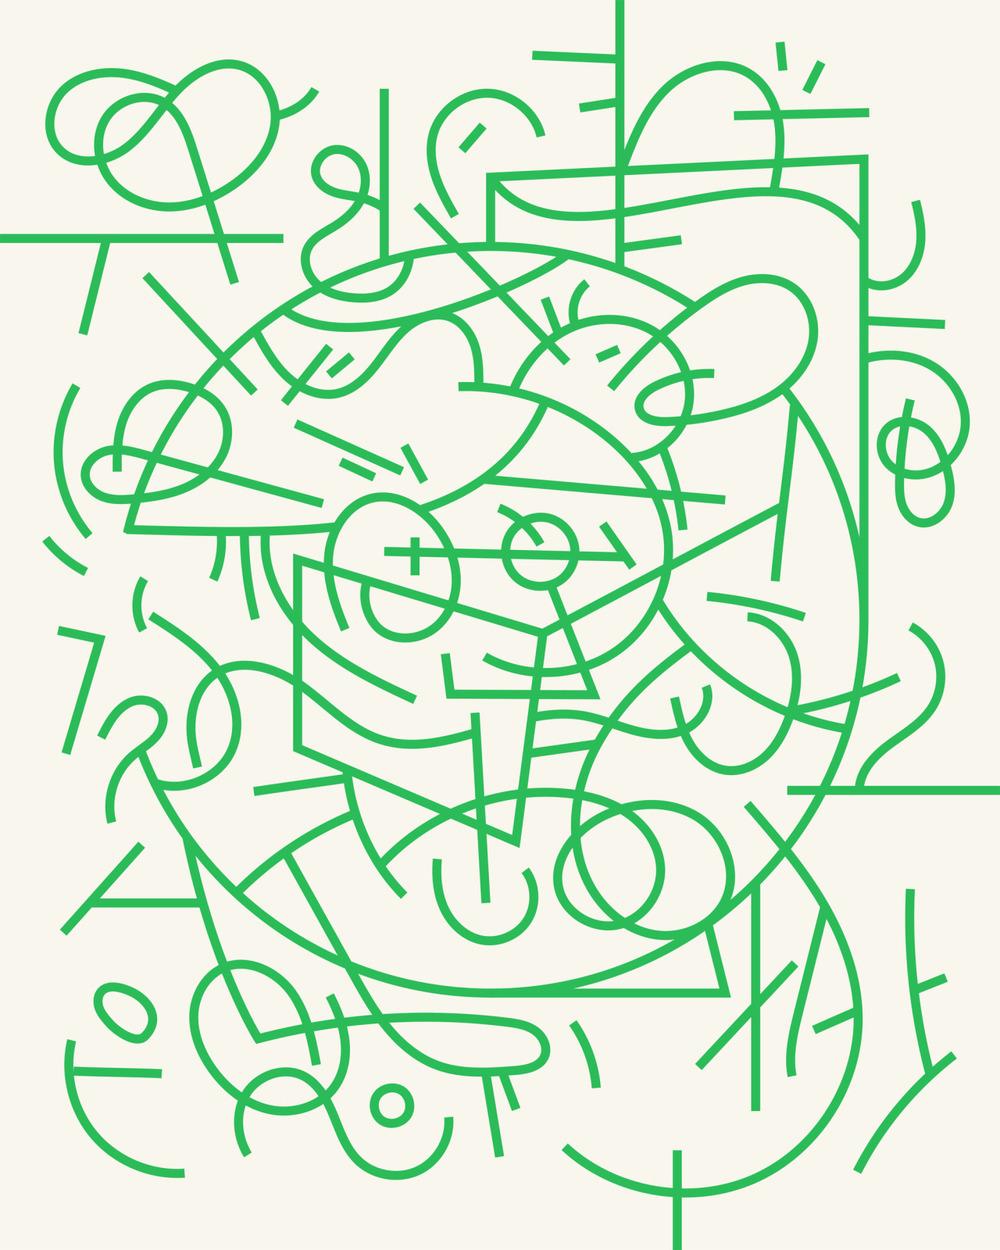 tumblr_ntv0gdg2Sk1rqf91so1_r2_1280.jpg